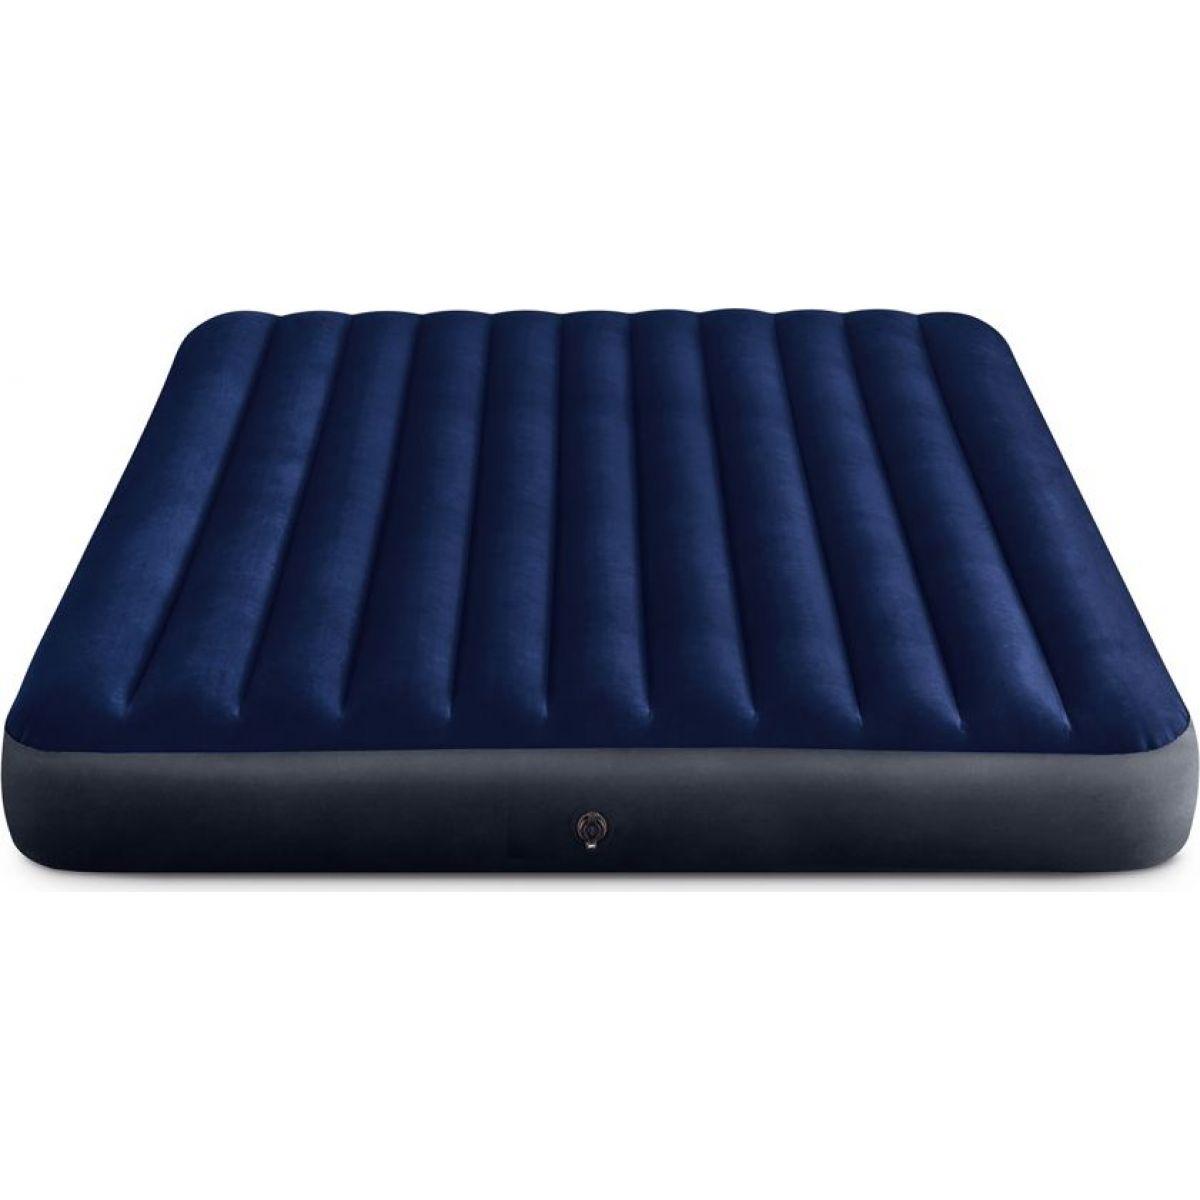 Intex 64755 Nafukovacia posteľ Standard King 183 cm x 203 cm